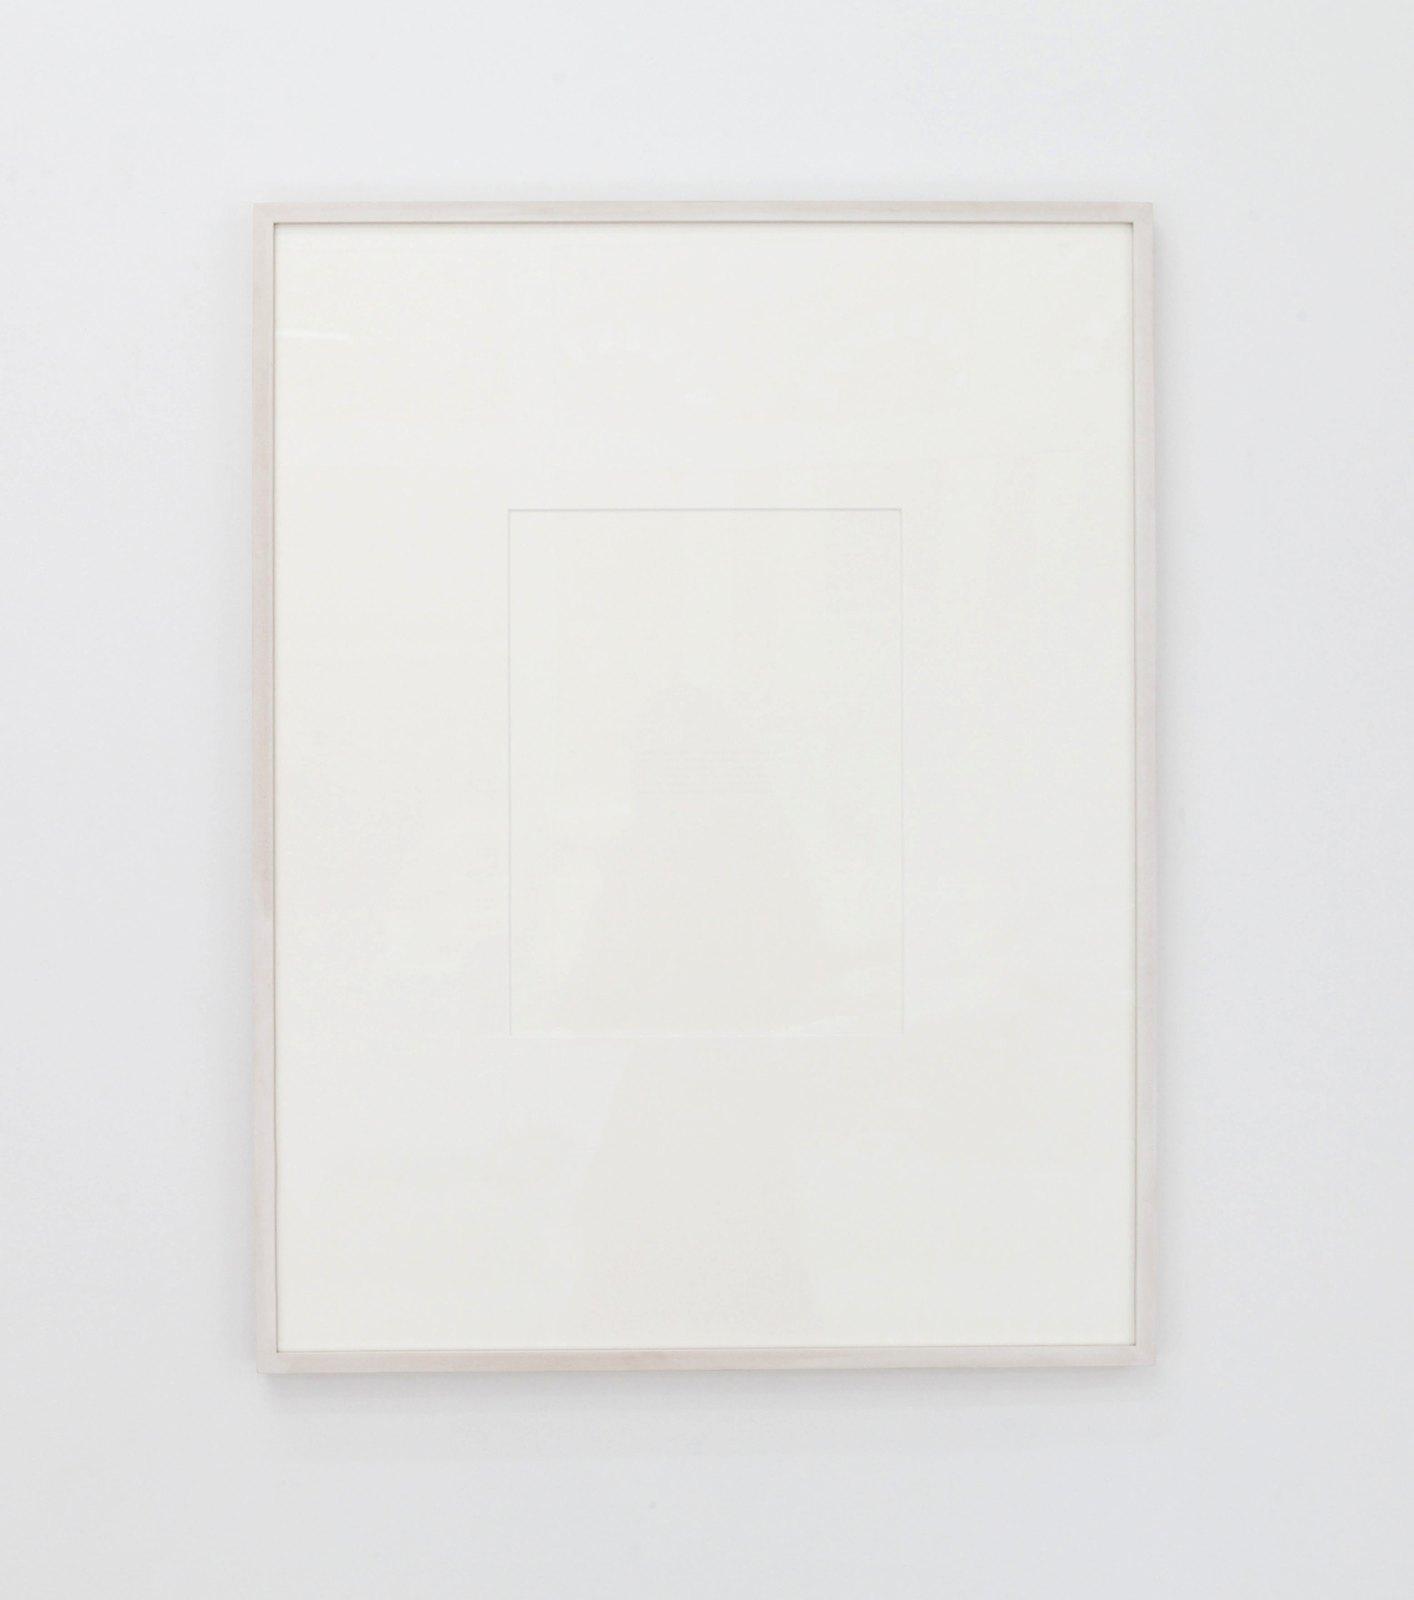 Lisa Tan, 2 Americans, 2010, letterpress on paper, 65 x 85 cm, Ed. 5